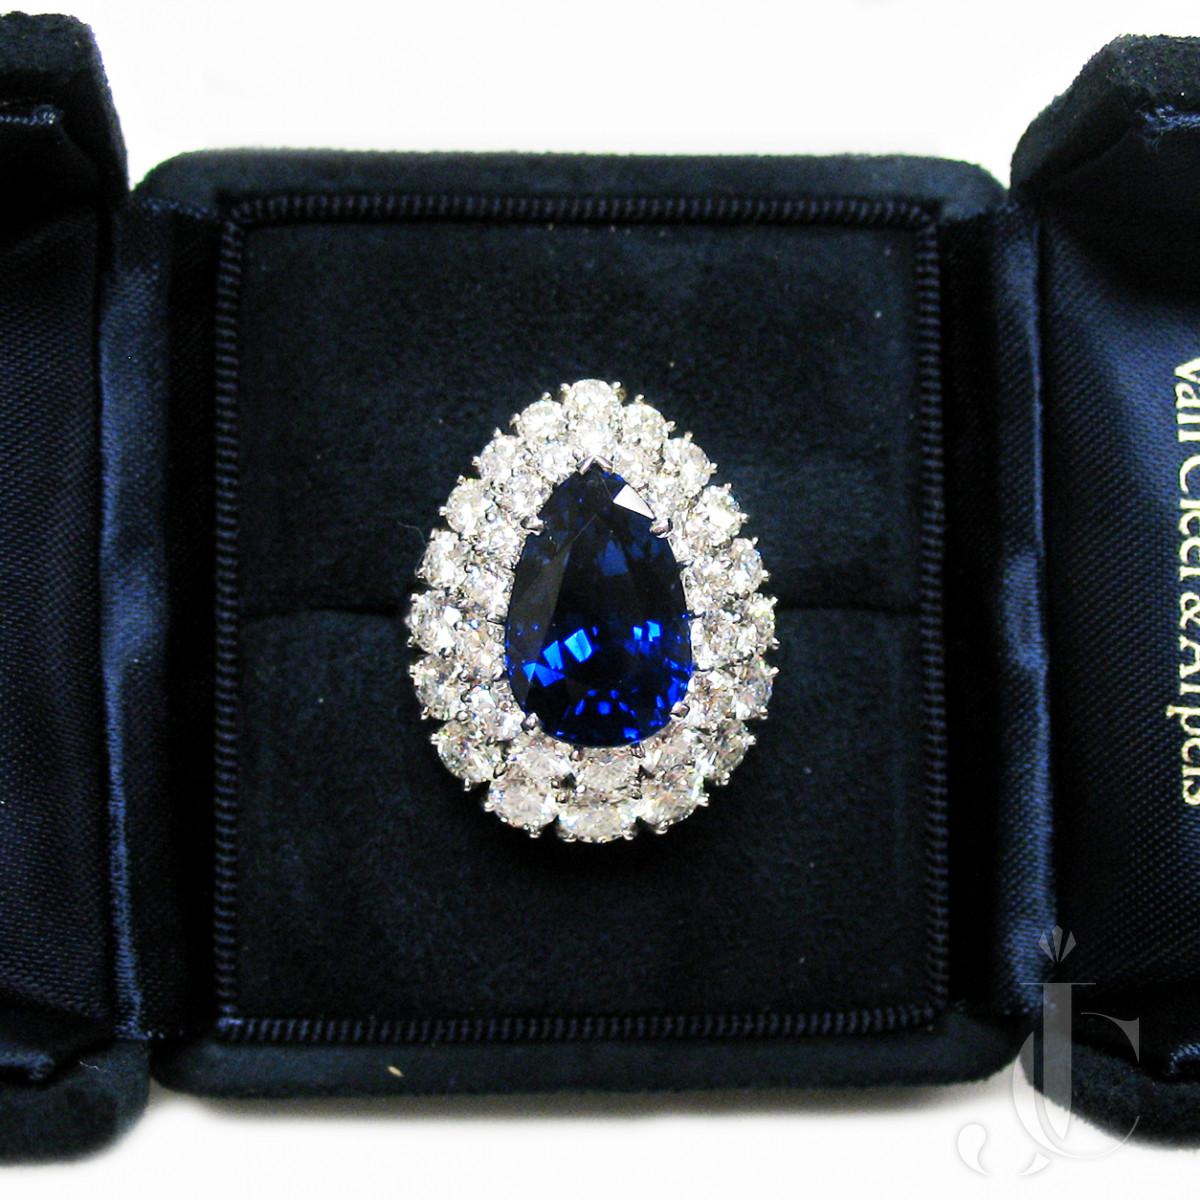 Platinum Pear Shape Sapphire and Diamonds Ring, Van Cleef & Arpels